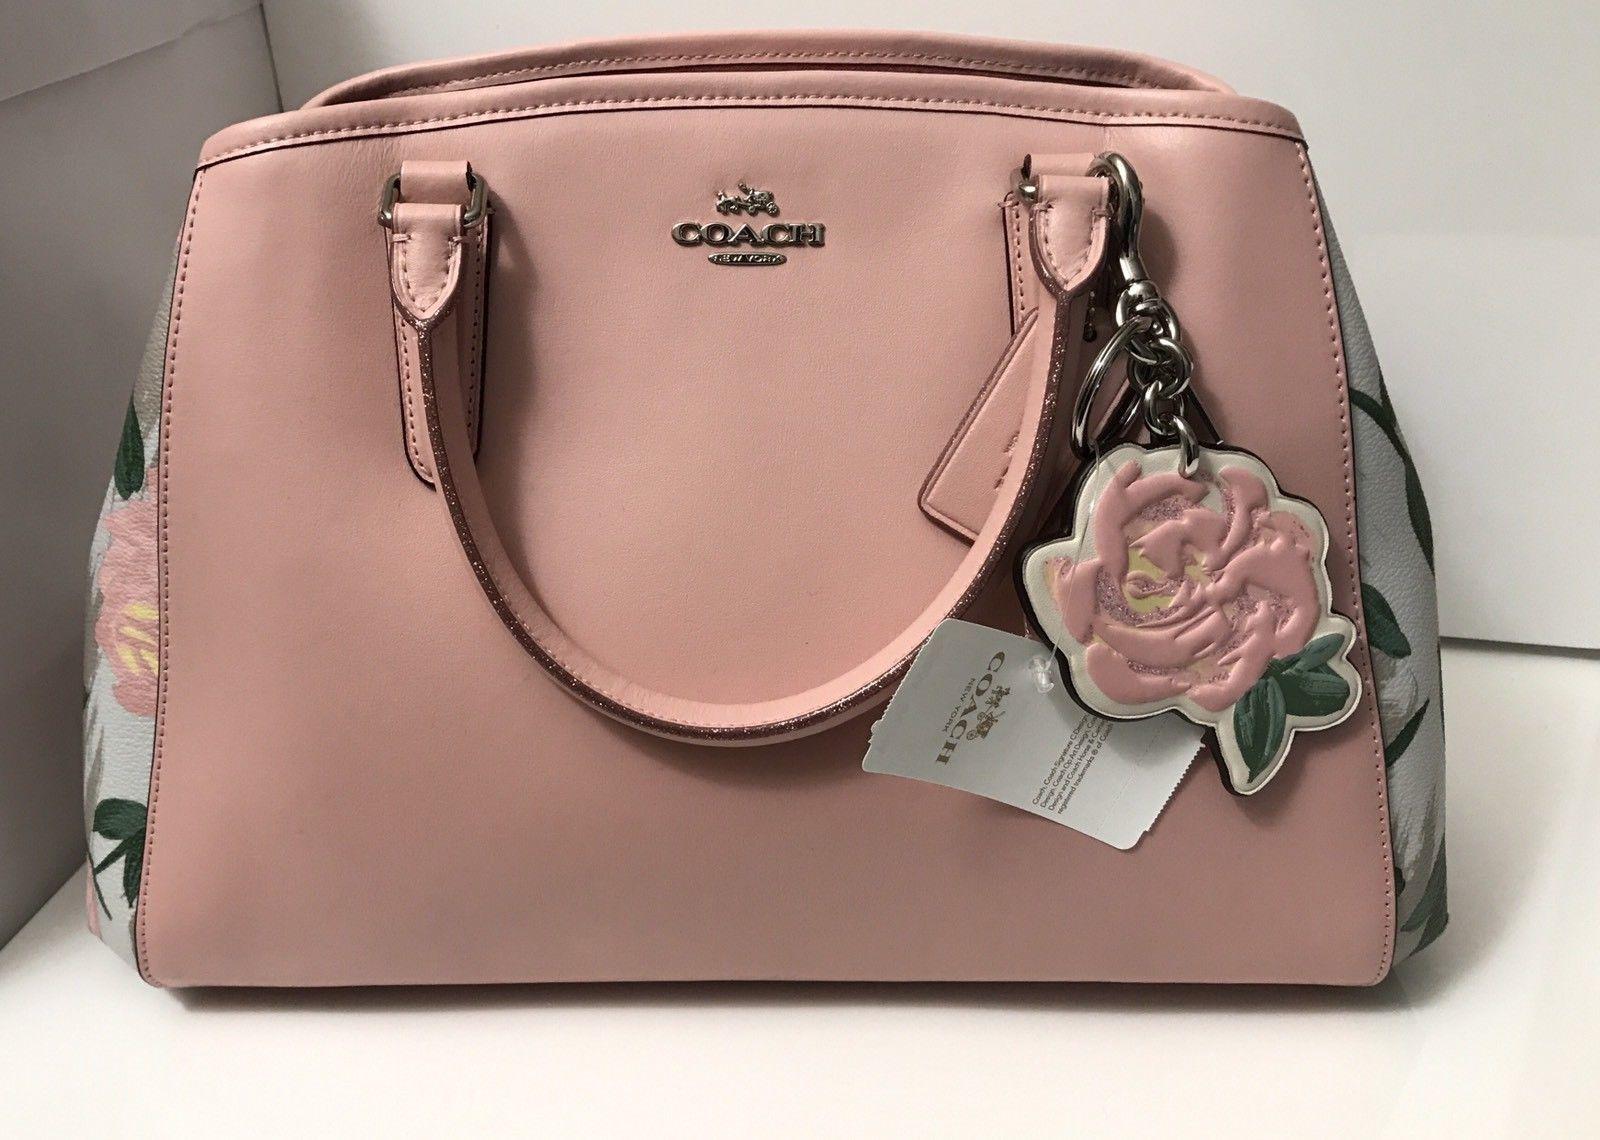 Nwt Coach F25868 Small Margot Carryall Camo And 50 Similar Items Rose Floral Print Pink Multi Handbag